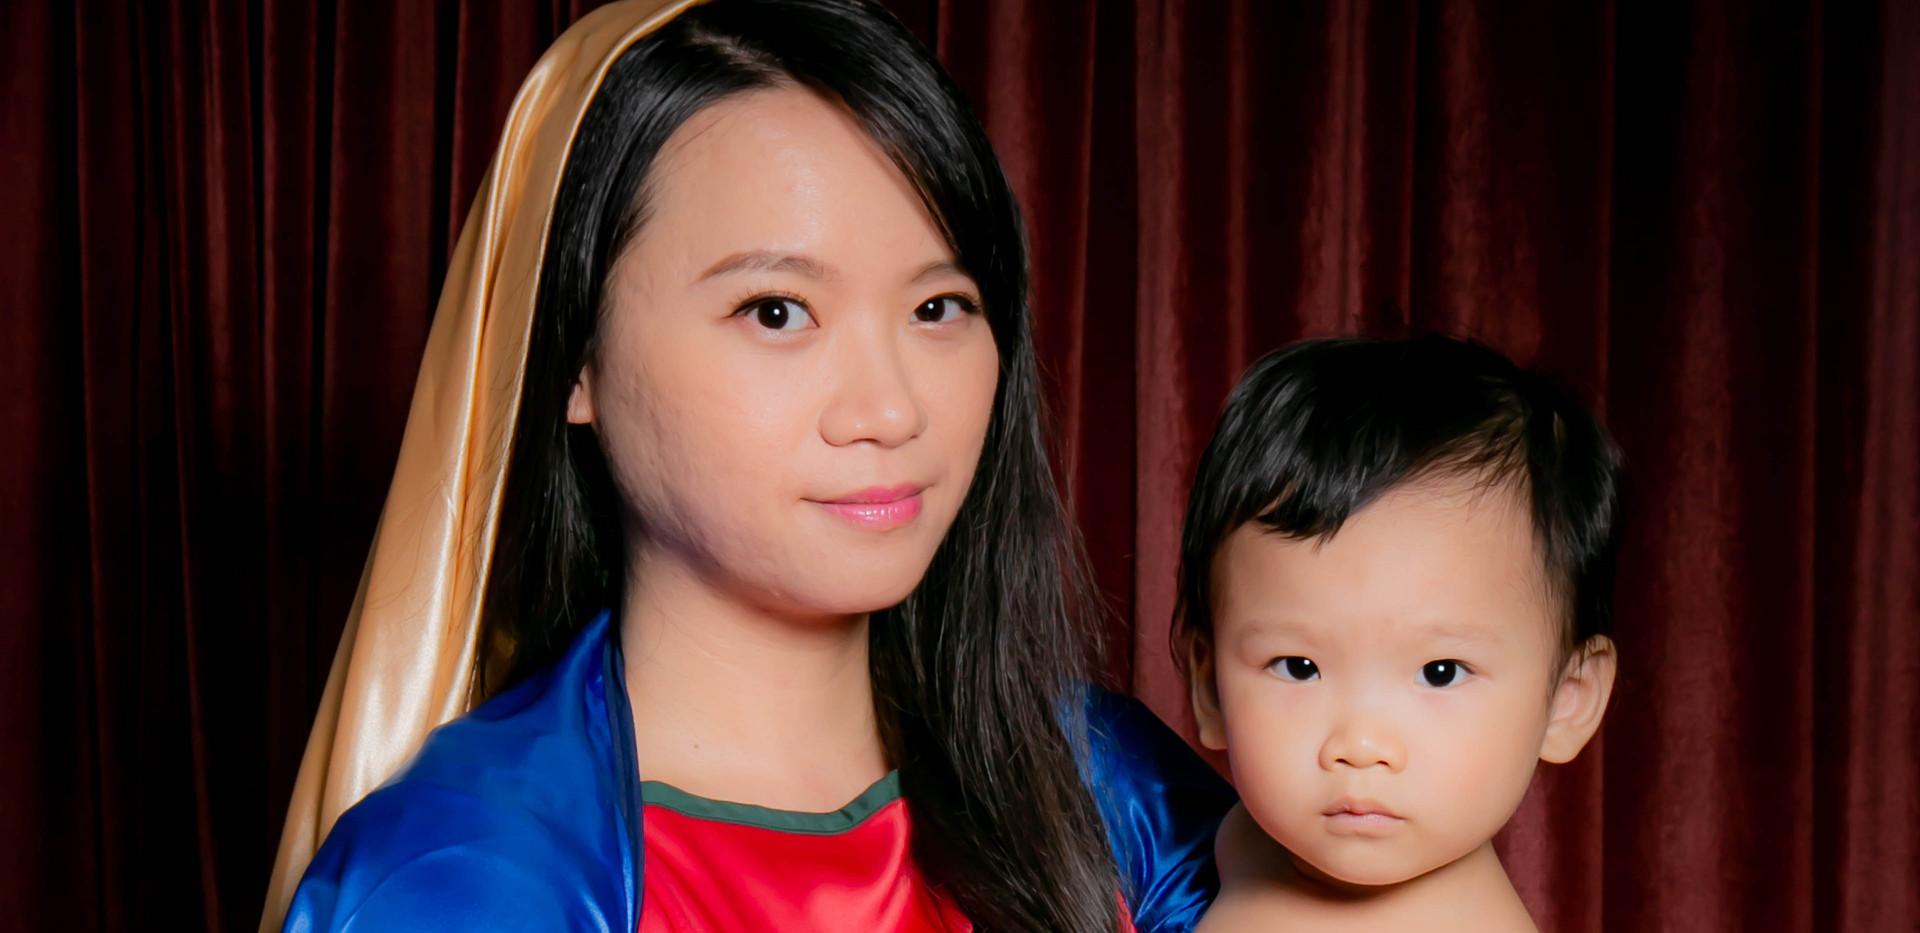 yichiao 21 century madonna and child 3.j